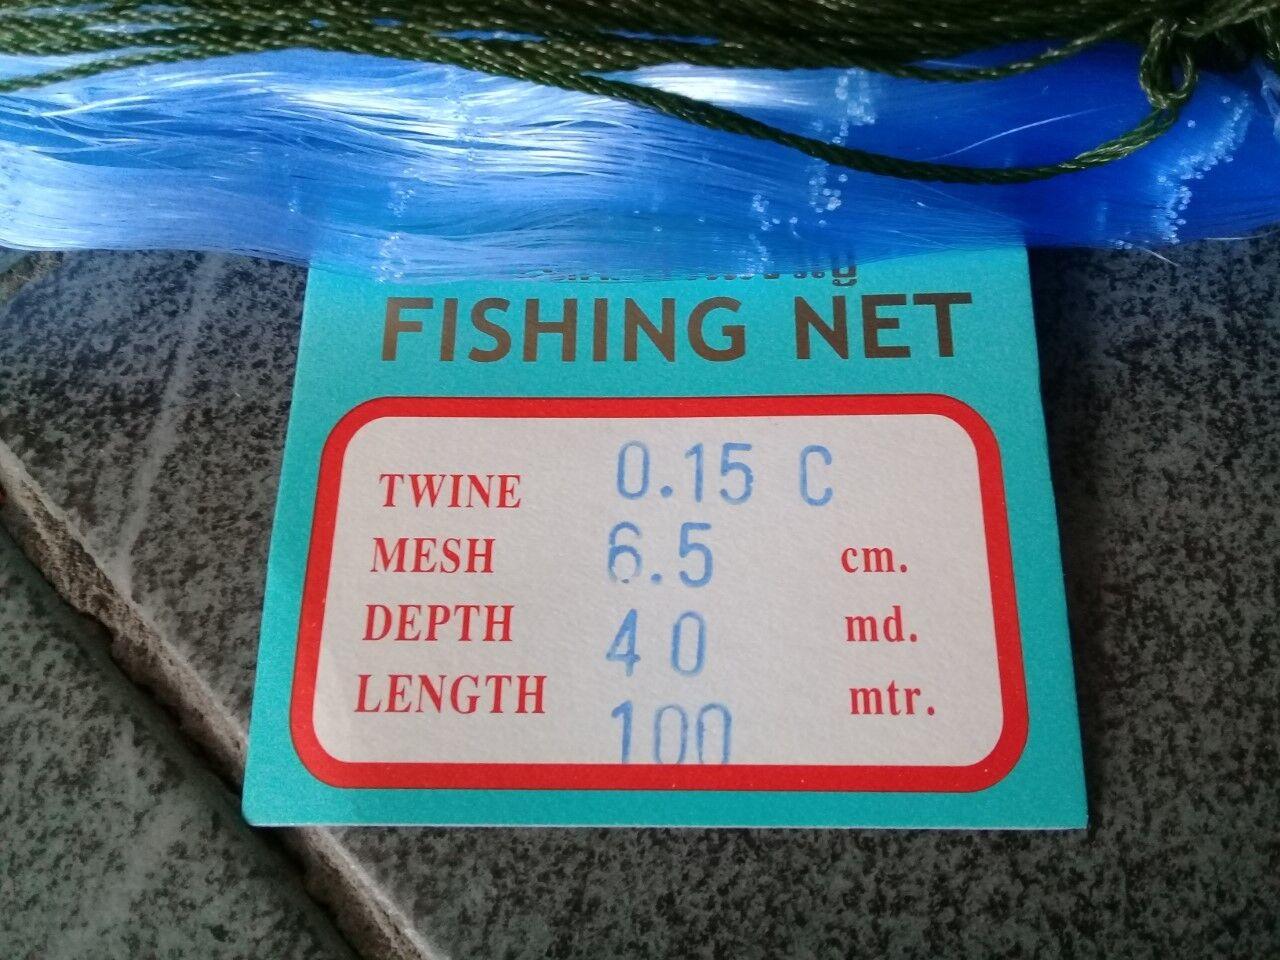 GILL NET 20 meters. 6.5cm mesh Dimensione  (65 ft) long   7ft depth POST FREE..